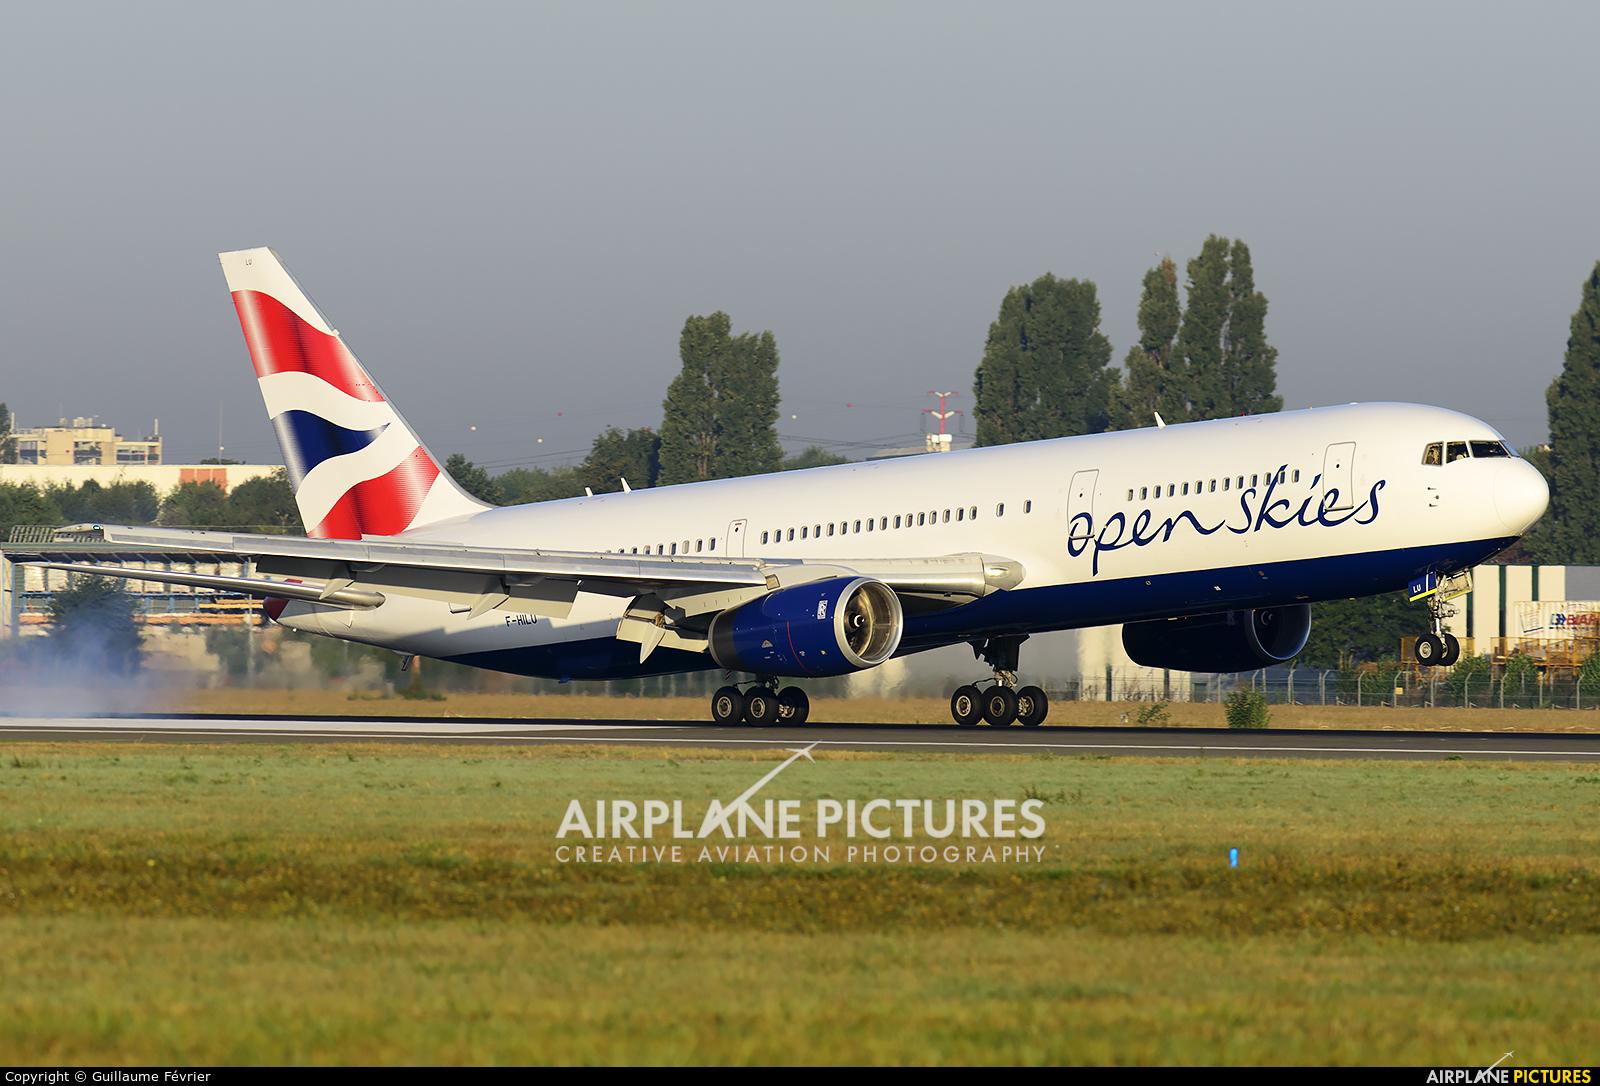 British Airways - Open Skies F-HILU aircraft at Paris - Orly